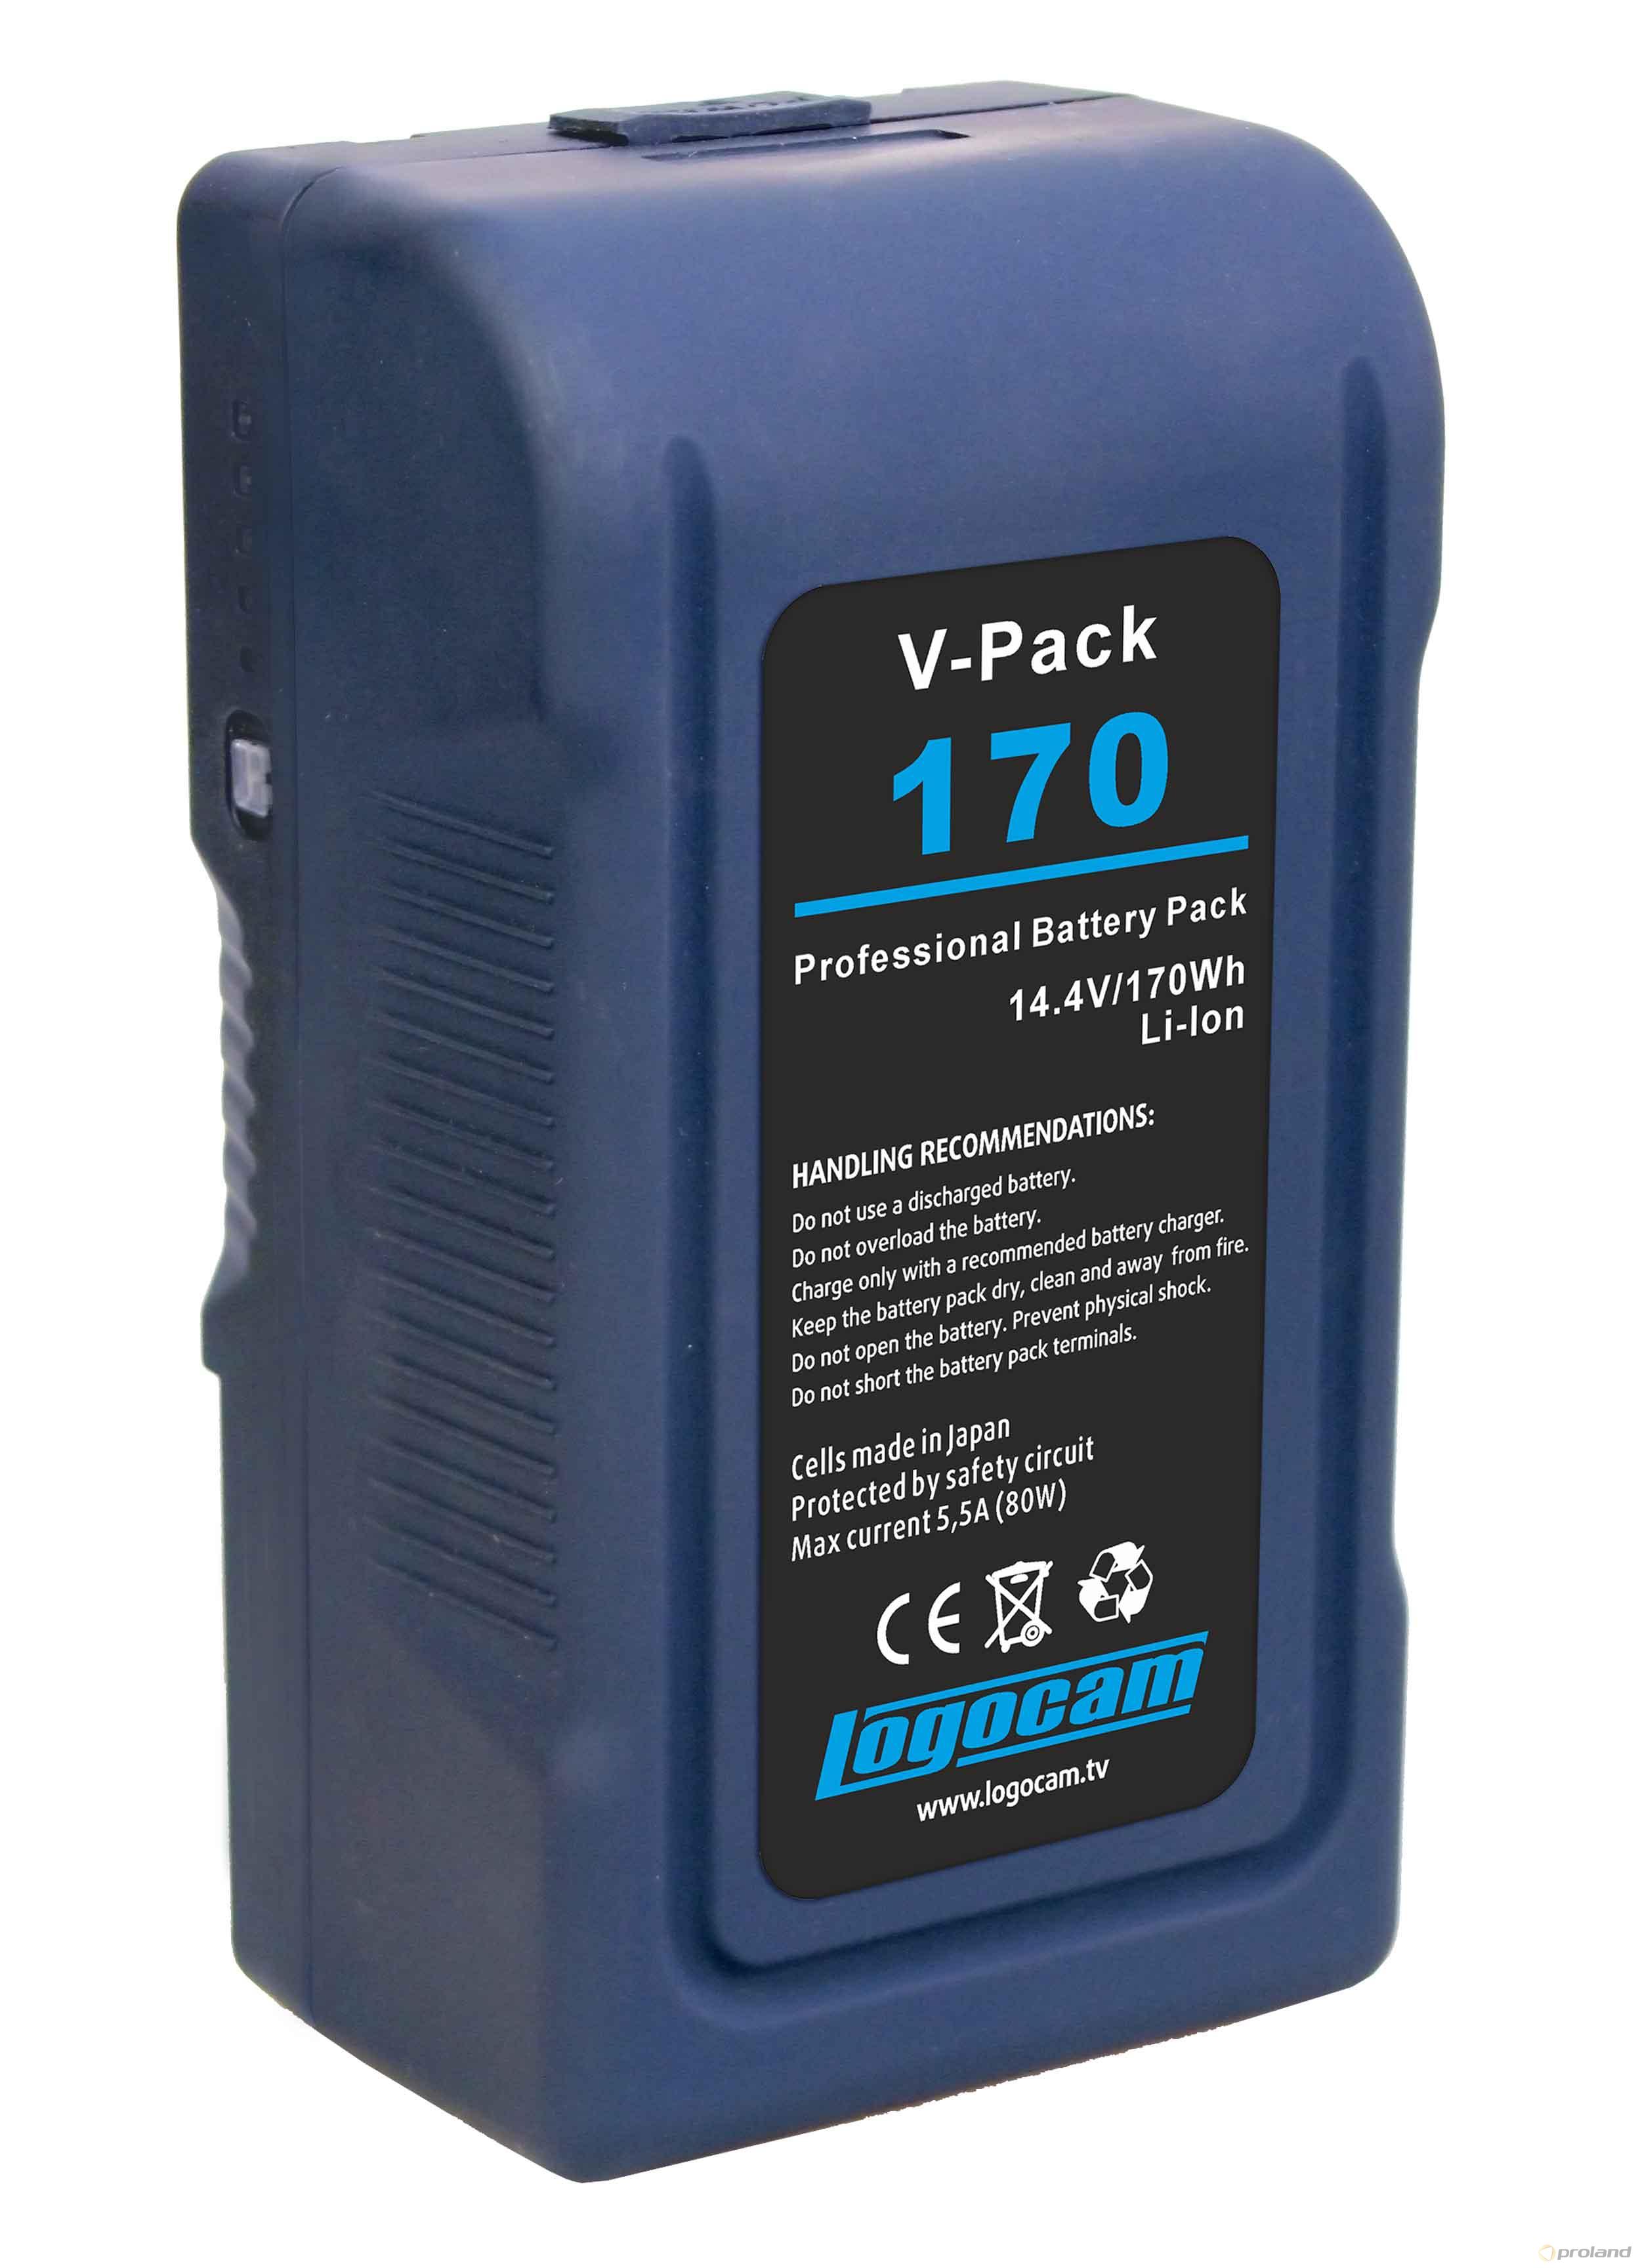 Logocam V-Pack 170